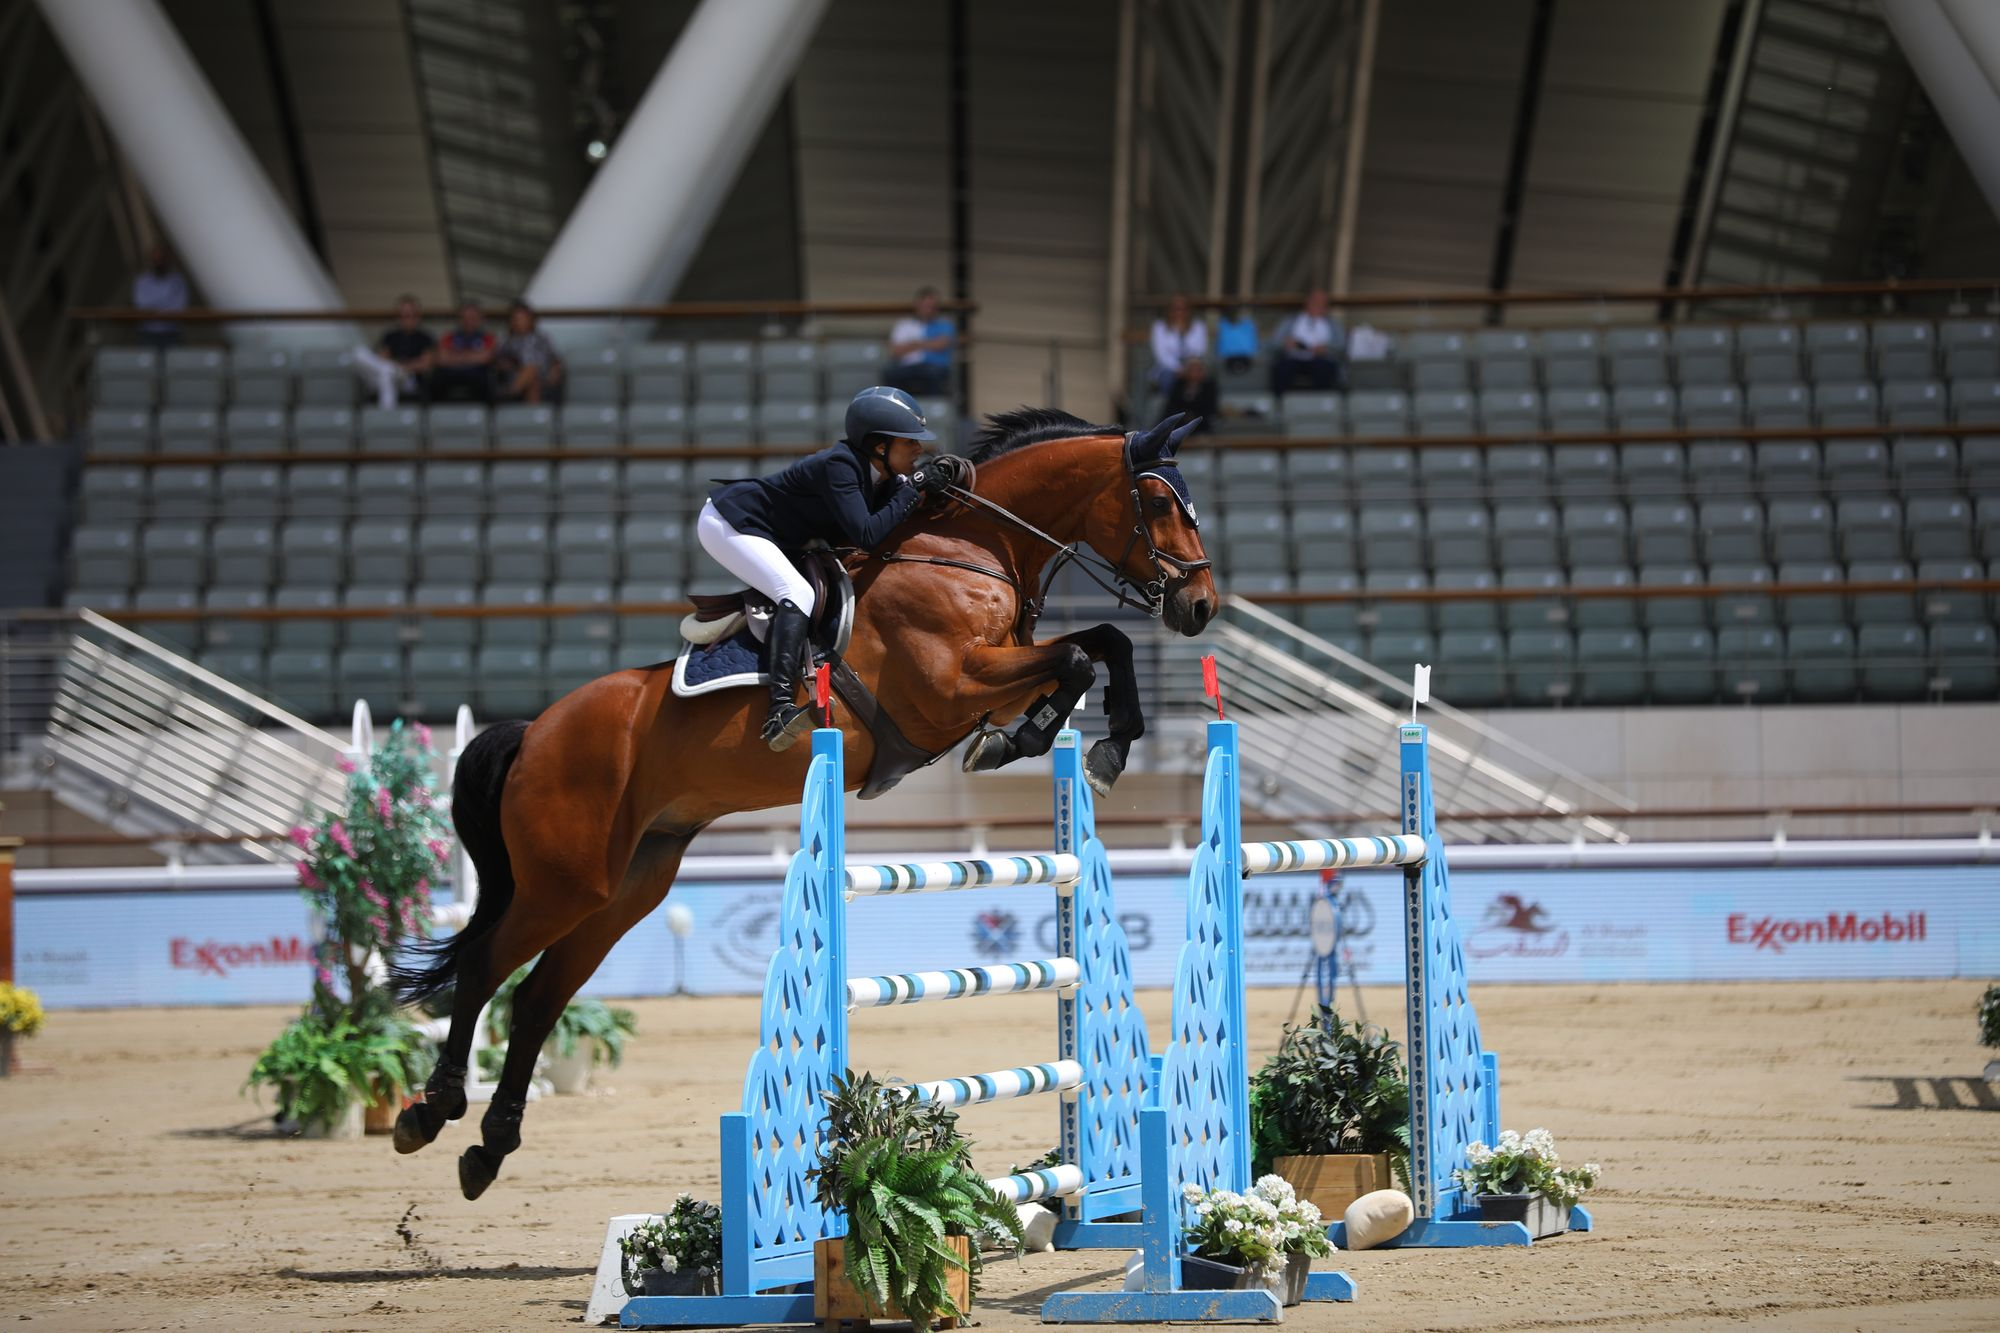 Expat Adventures - Meet a Champion Equestrian